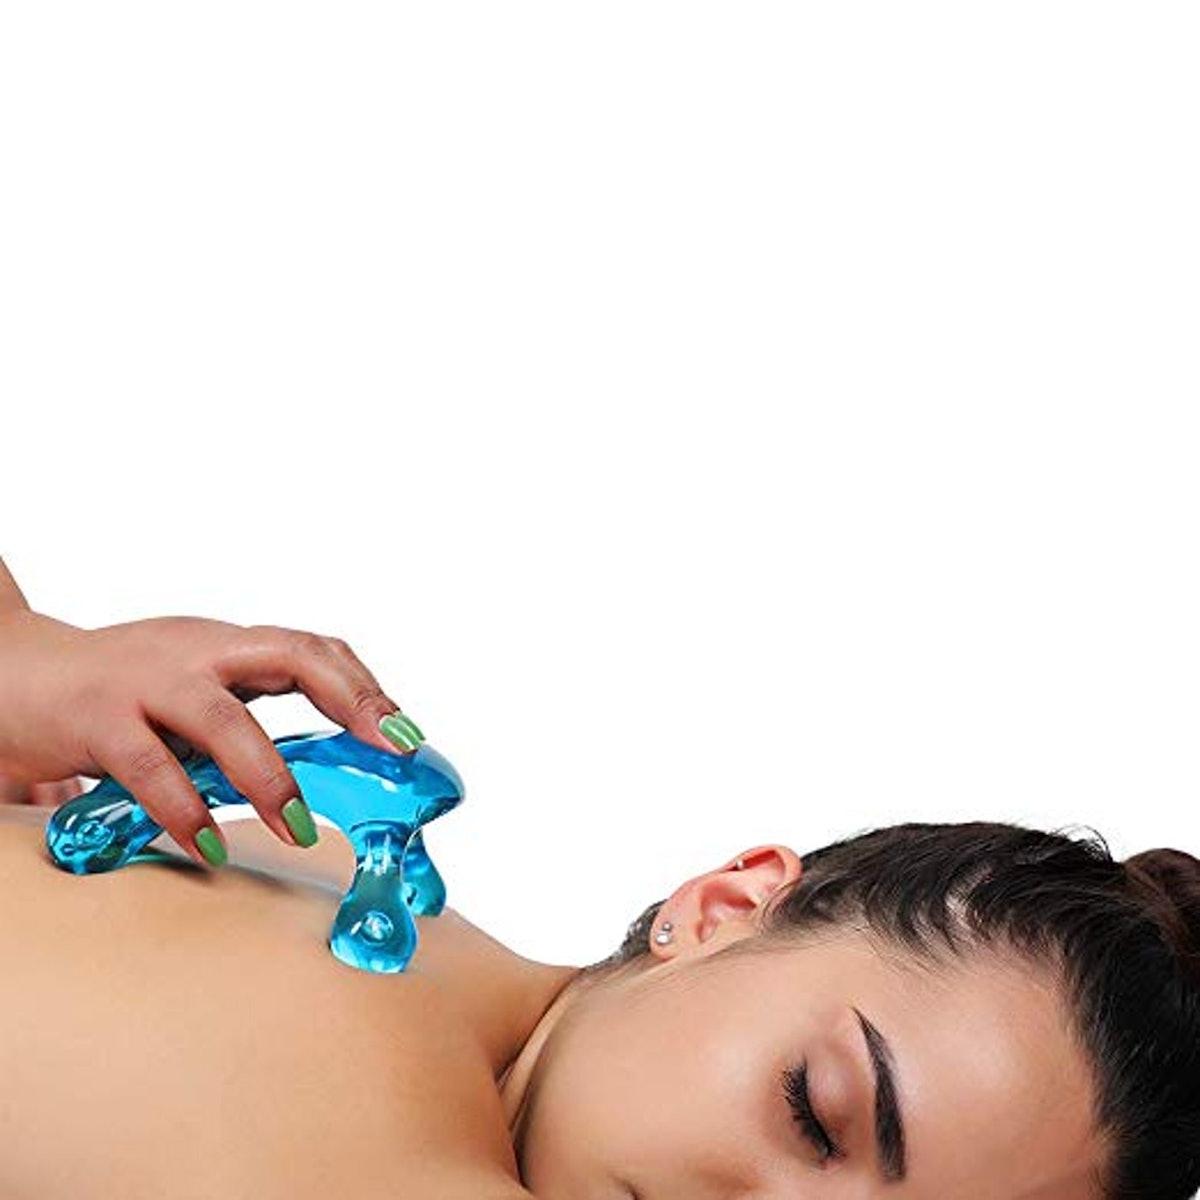 Health And Yoga Palm Urchin Massage Tool